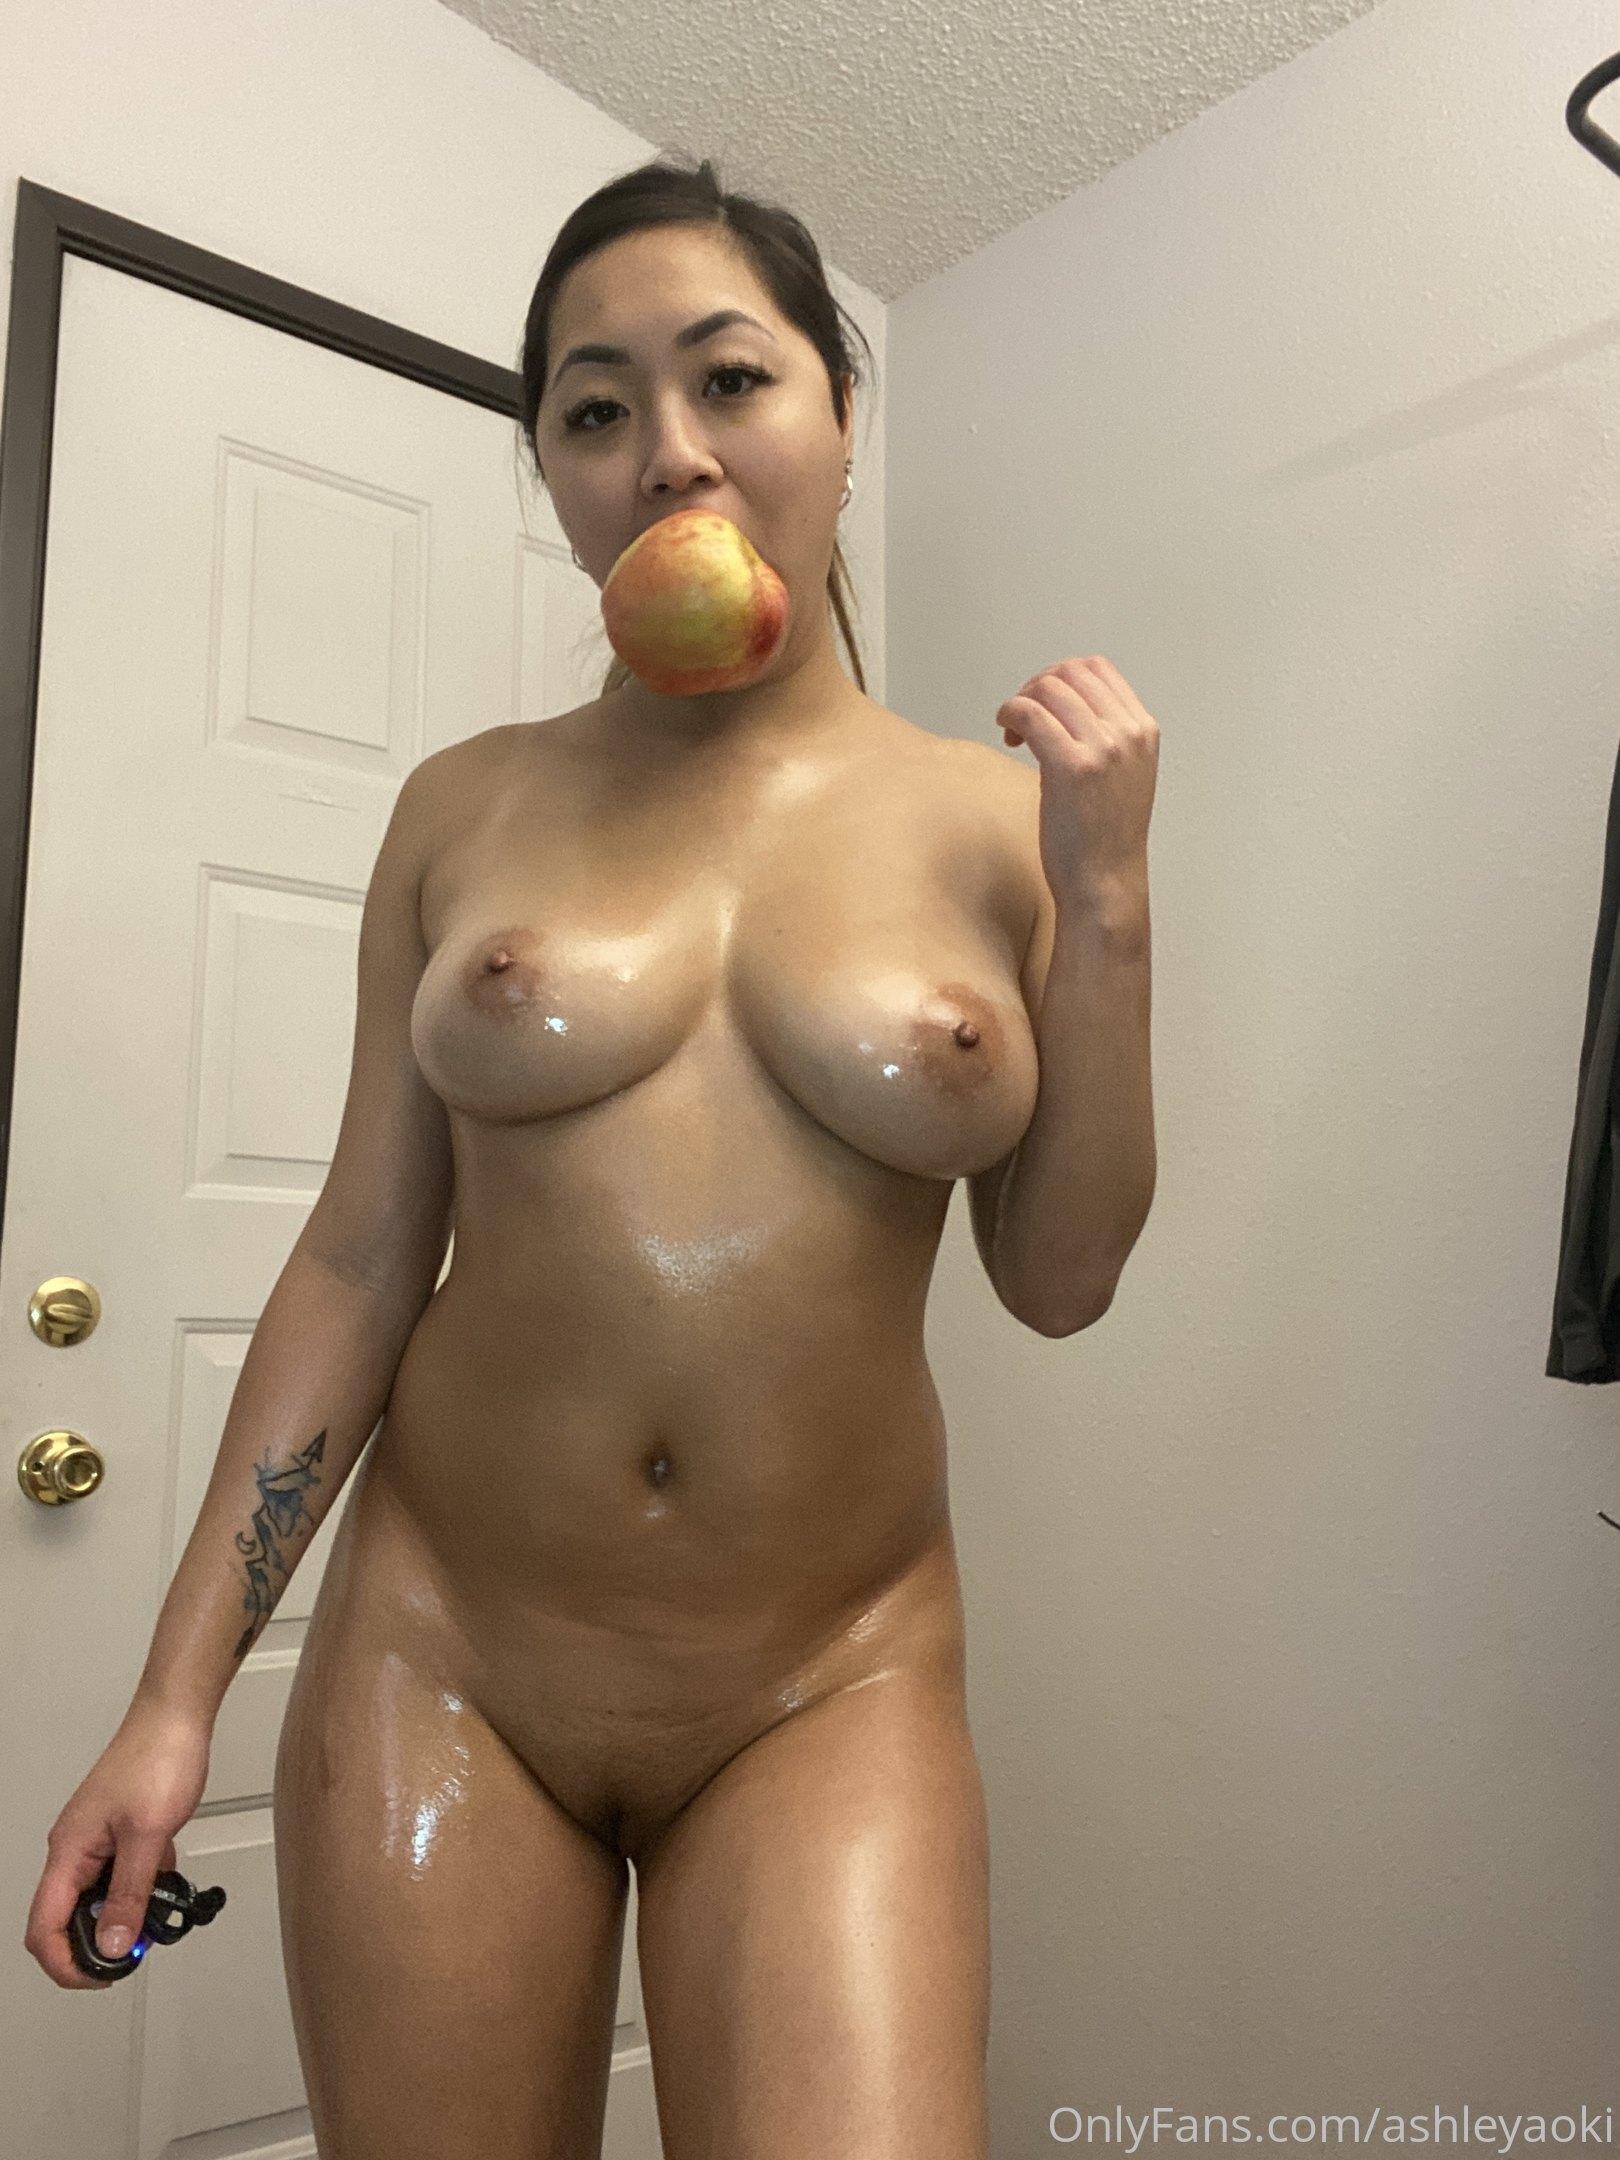 Ashley Aoki, Ashleyaoki, Onlyfans Leaks 0228